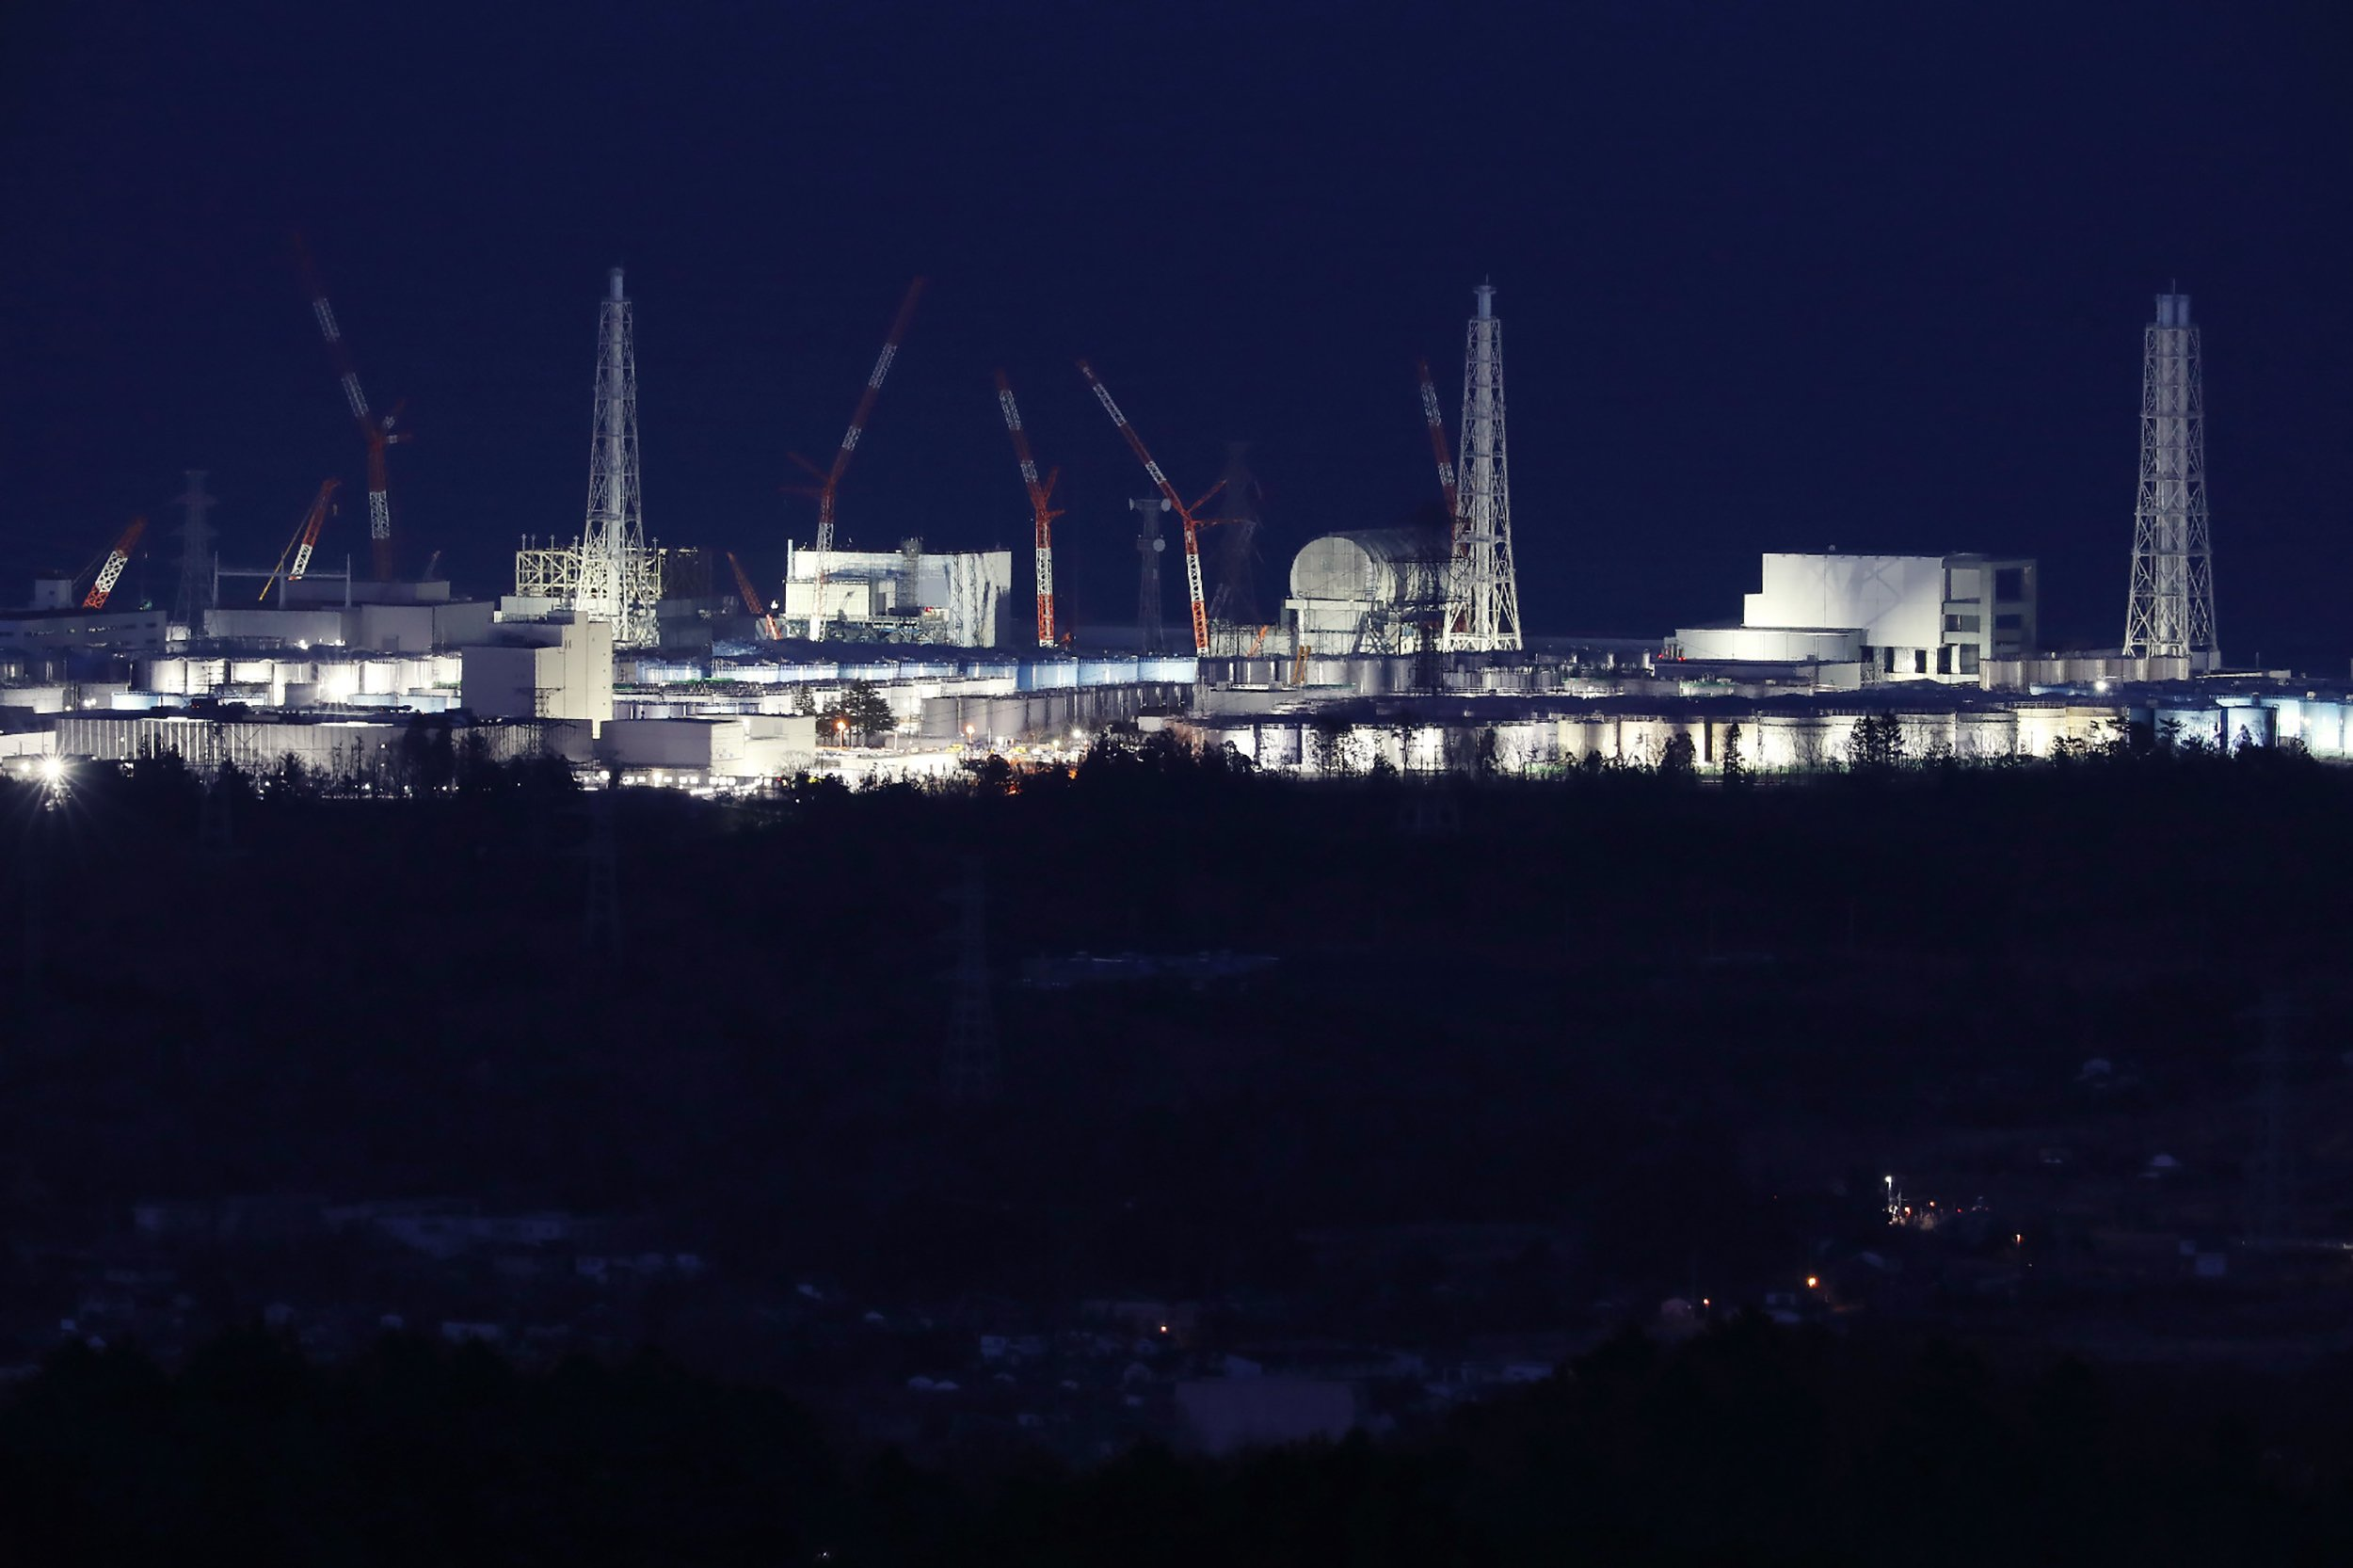 Fukushima Daiichi nuclear power plant, Japan